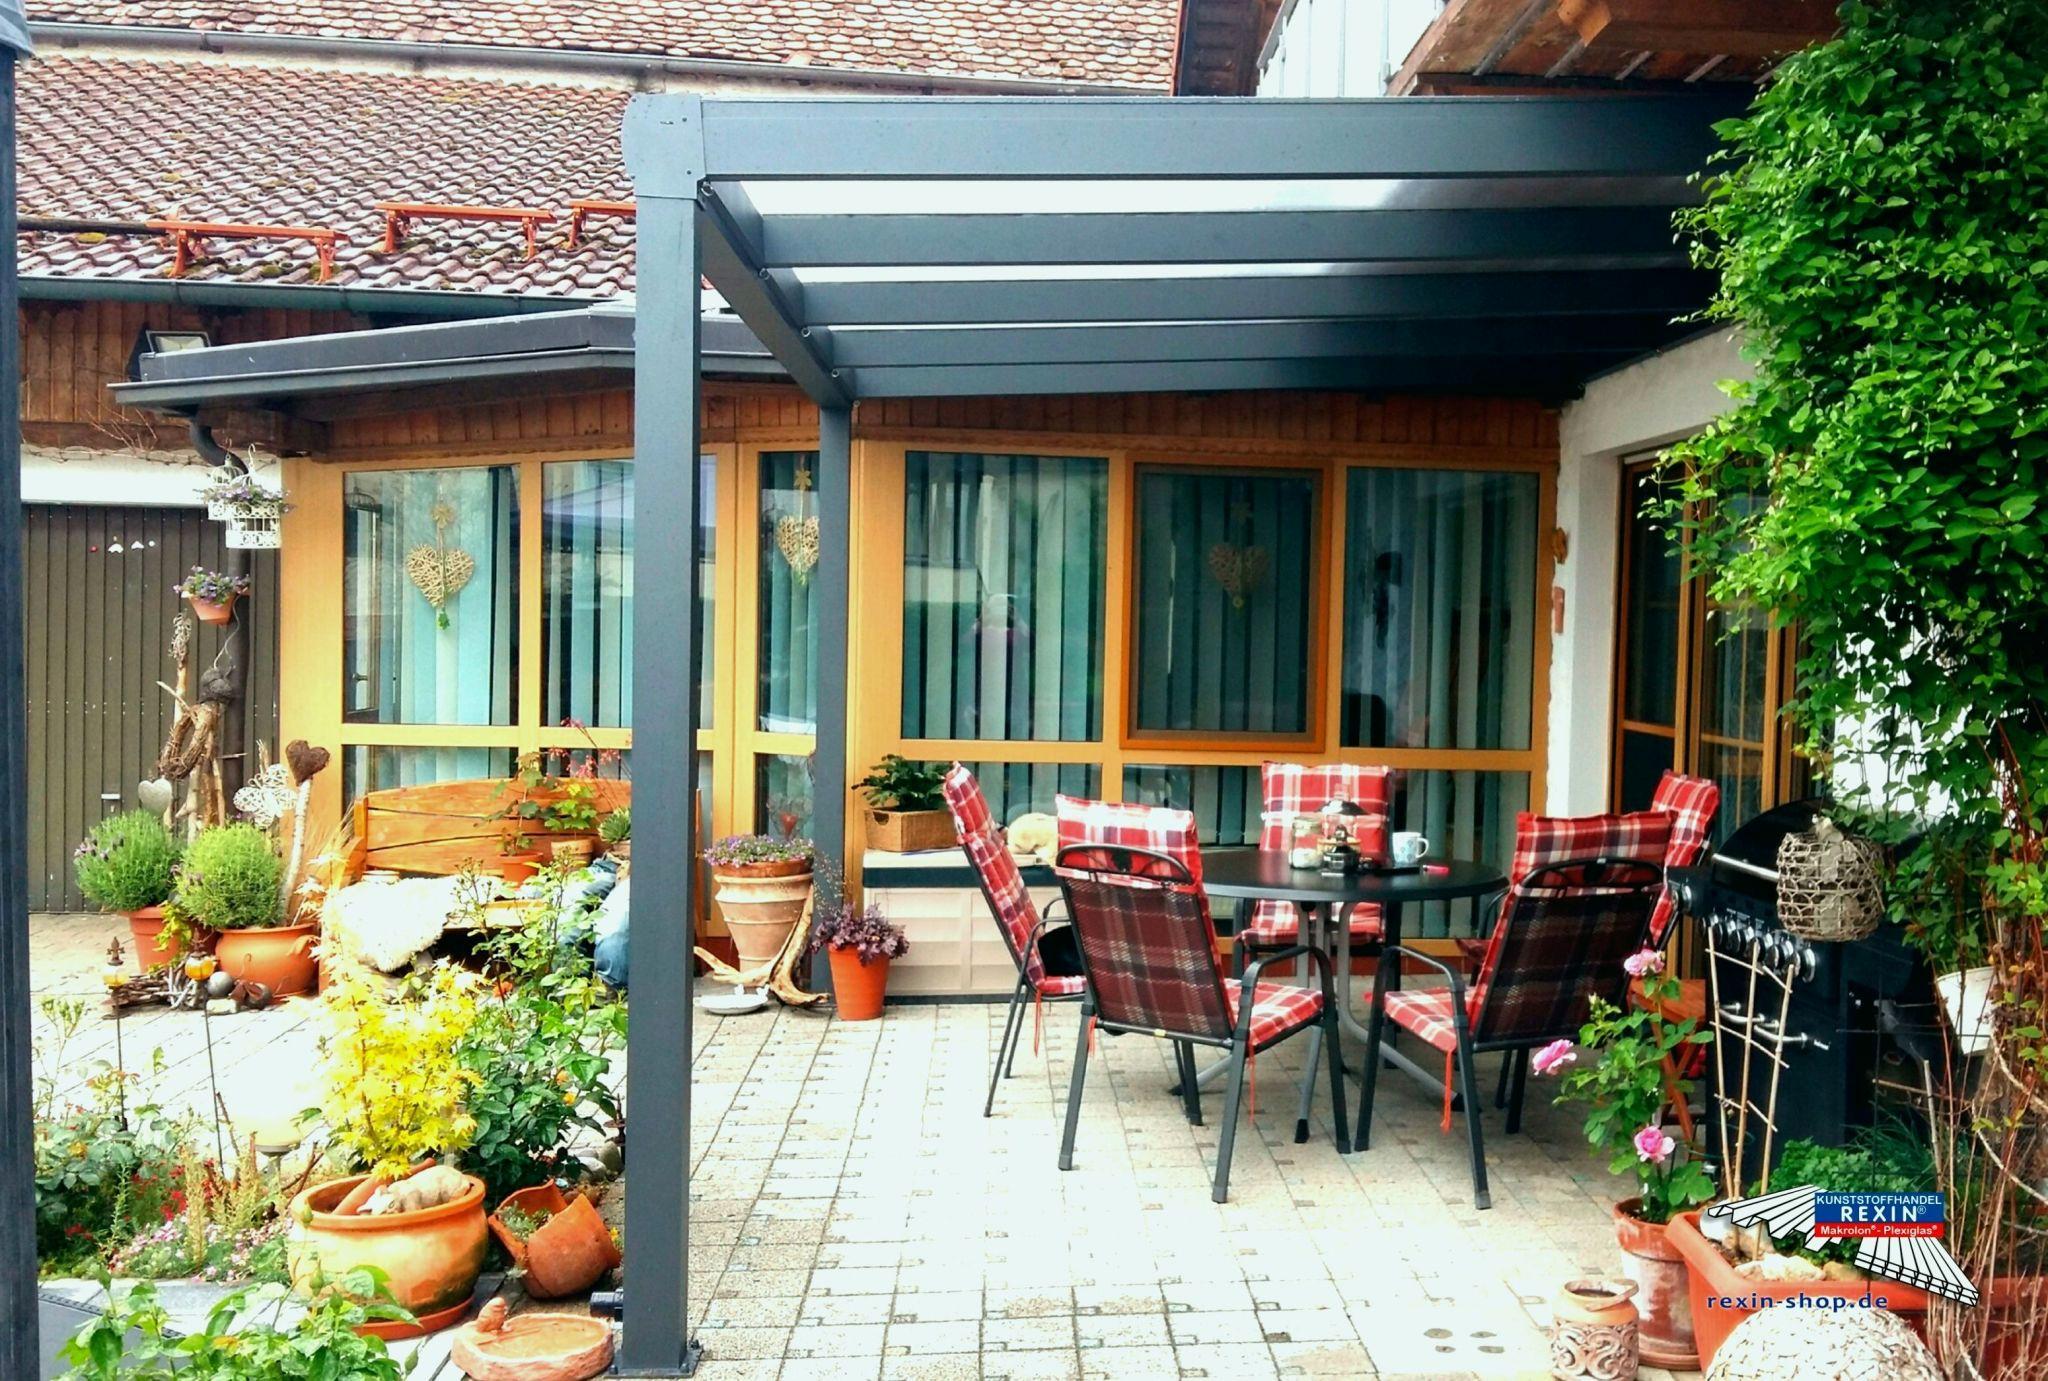 idee deco terrasse pas cher genial store jardin pas cher ainsi que mignonne idee deco terrasse pas cher of idee deco terrasse pas cher